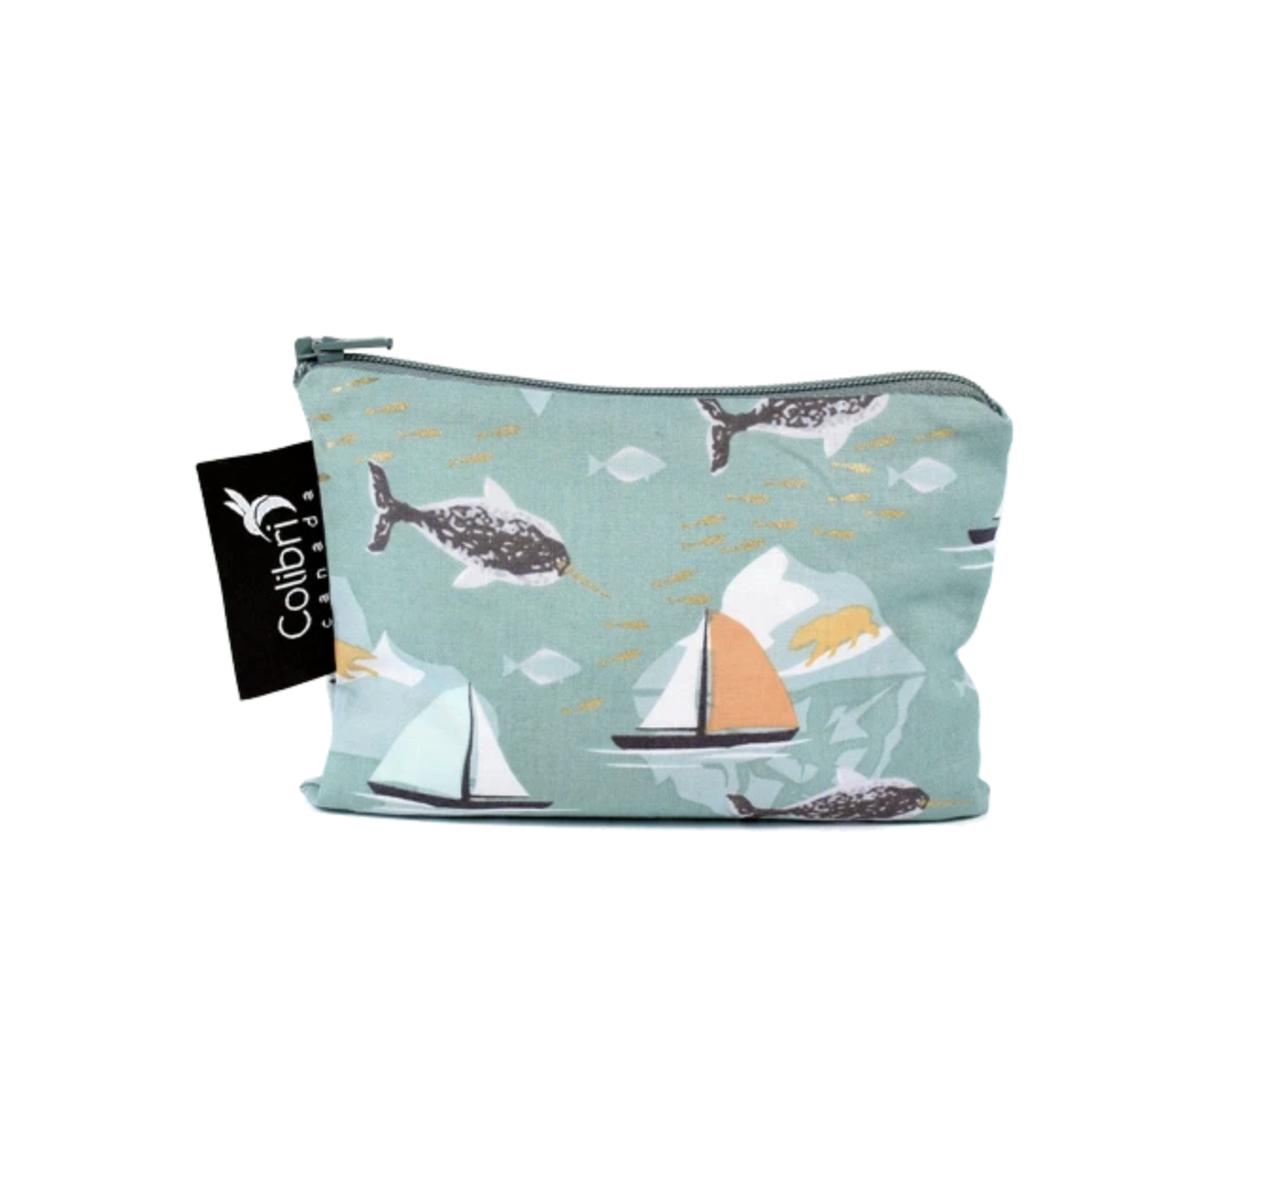 Narwhal Reusable Snack Bag (small)-1